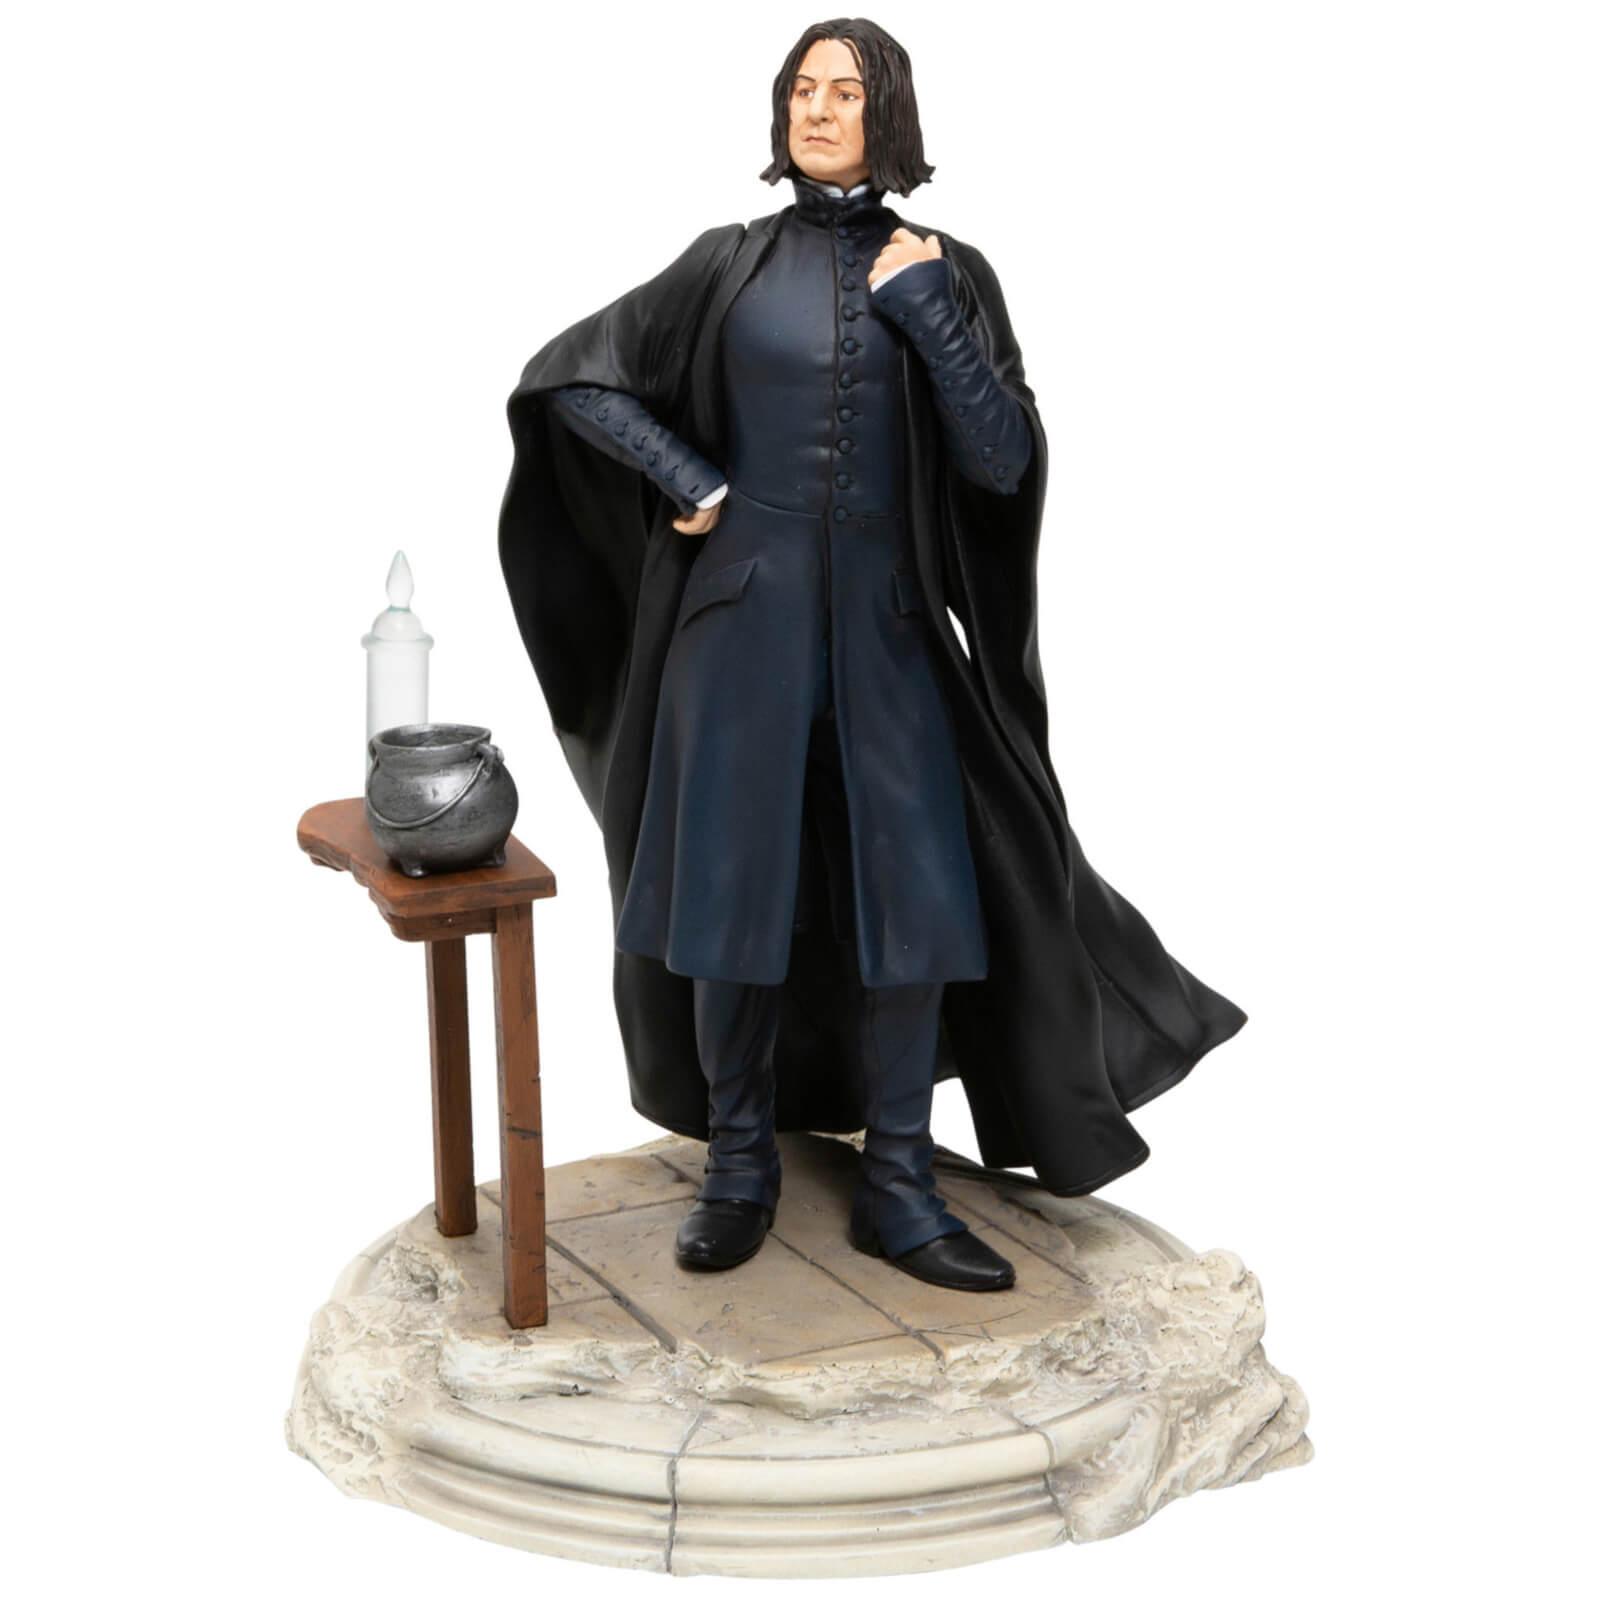 Image of Wizarding World Of Harry Potter Professor Snape Year One Figurine